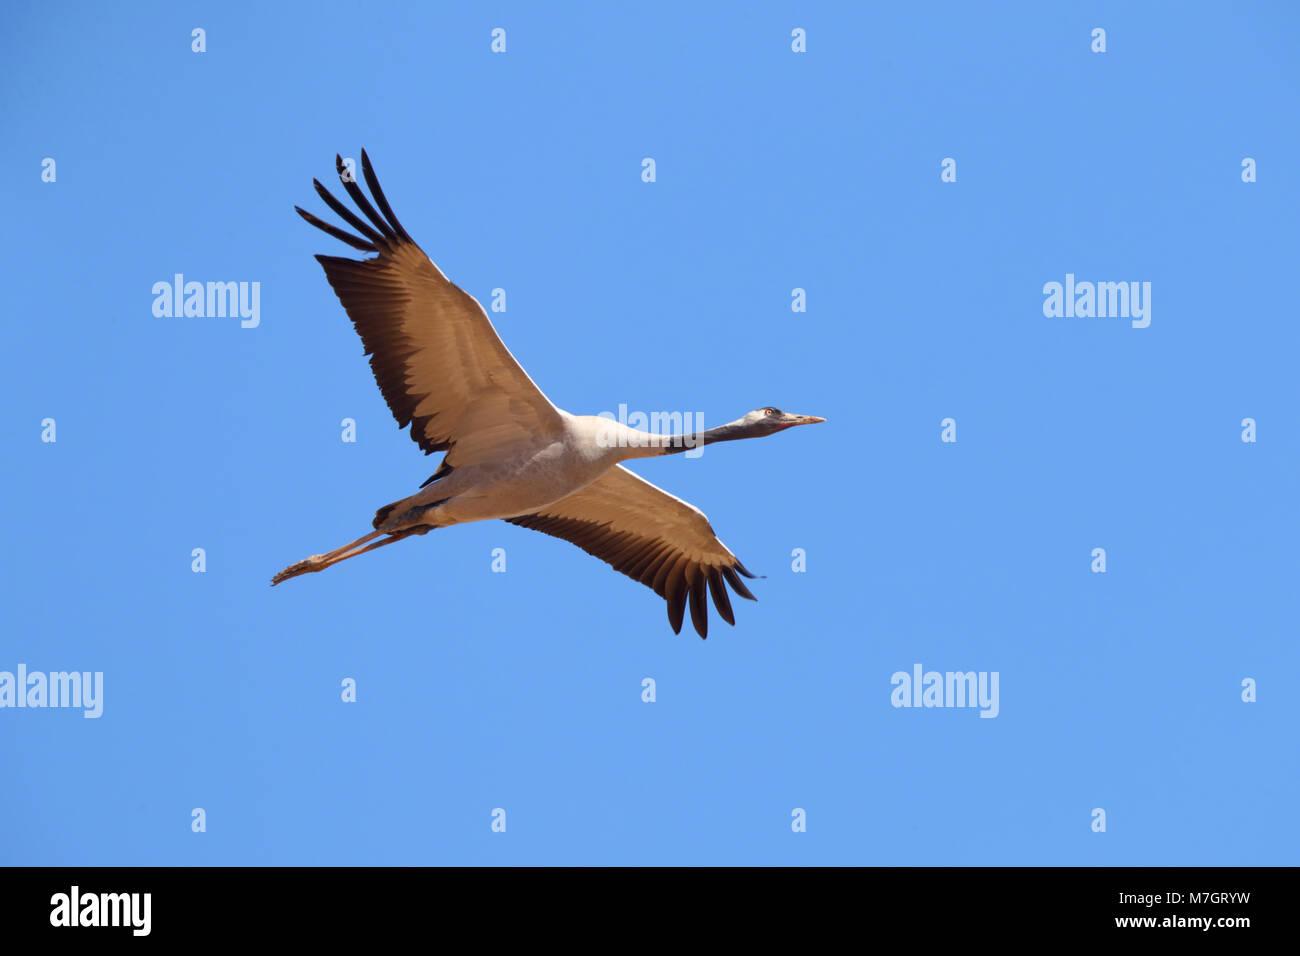 Grulla común en adultos (Grus grus) en vuelo cerca de Bikaner en Rajasthan, India Foto de stock